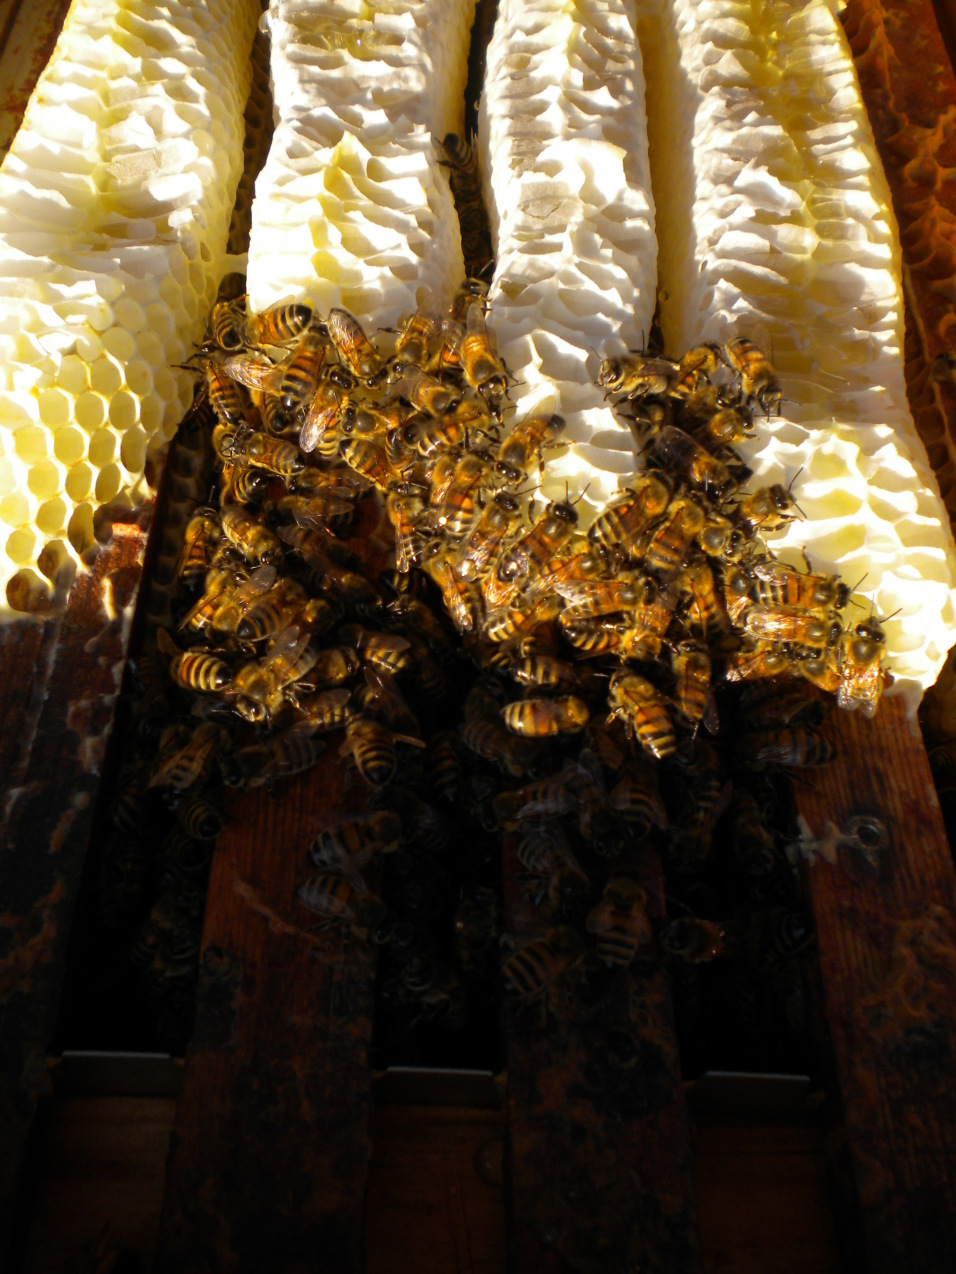 Bijen op de wintertros